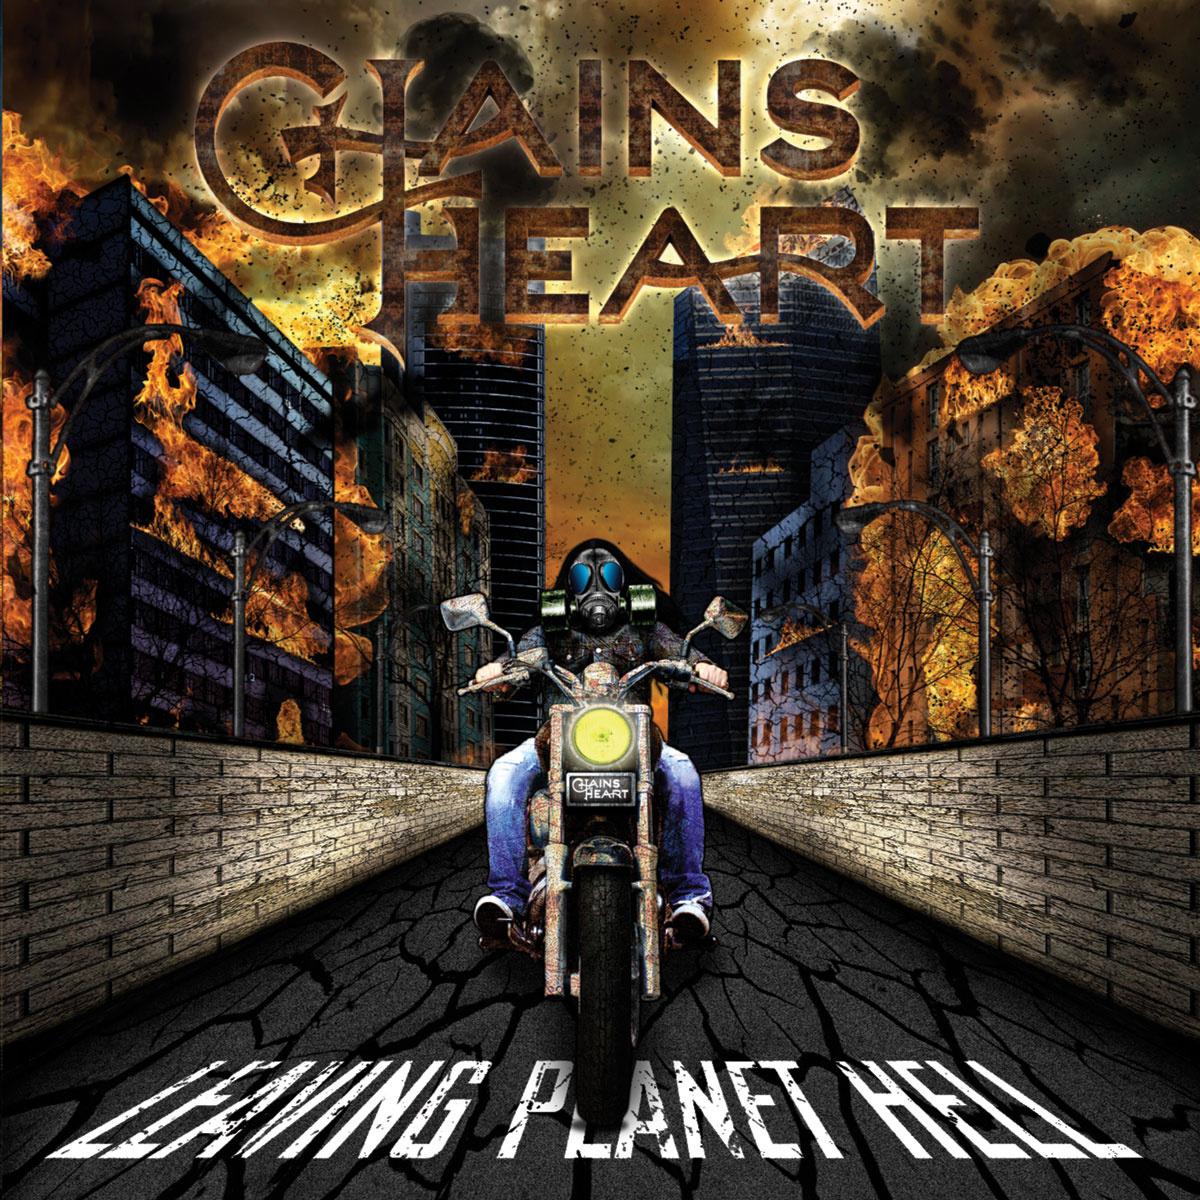 Chainsheart – Leaving Planet Hell